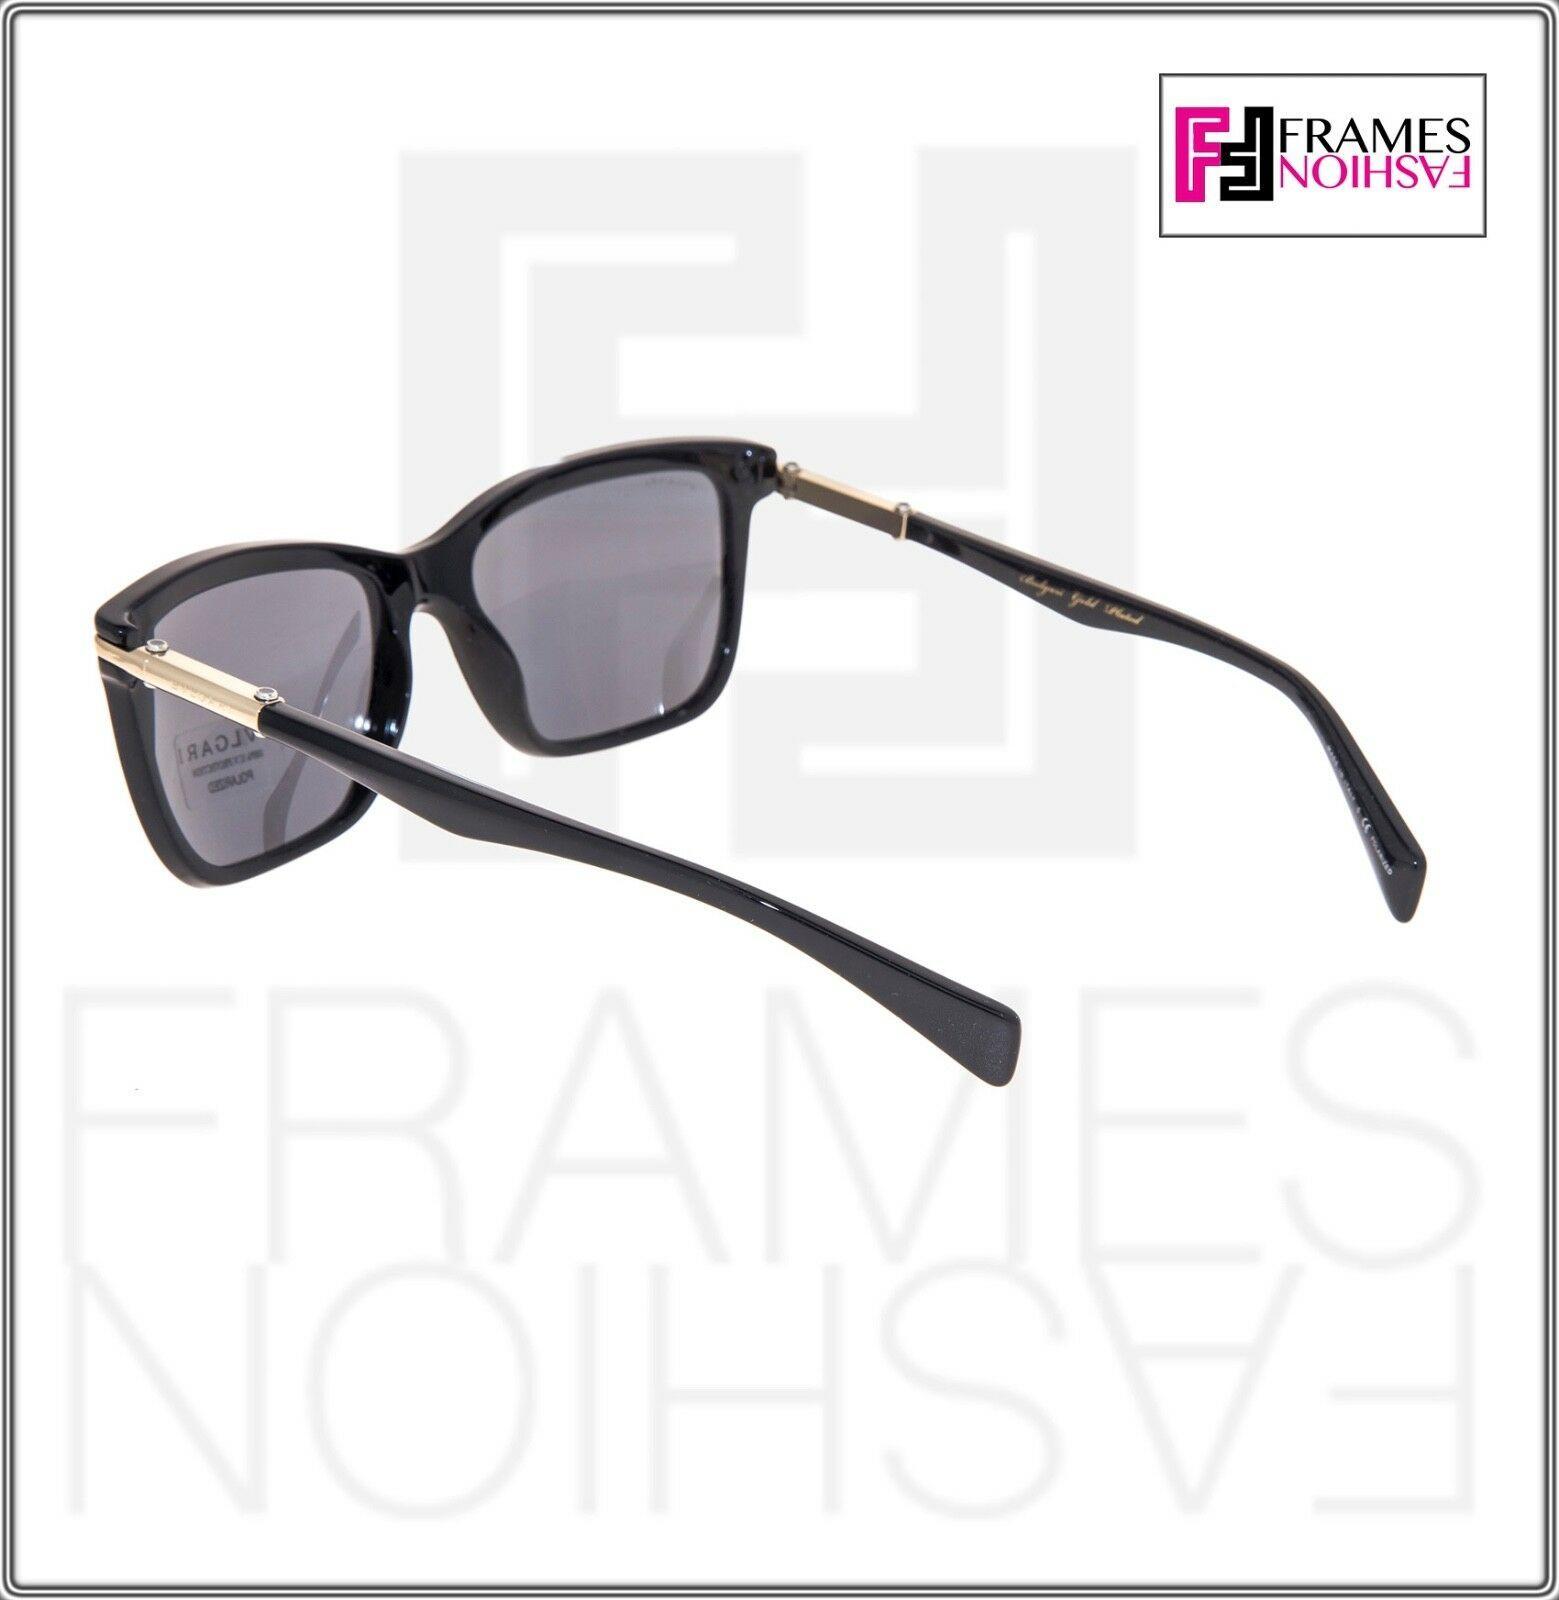 BVLGARI Le Gemme Men BV7028K Black Gold 18K Plated POLARIZED Sunglasses 7028 image 3